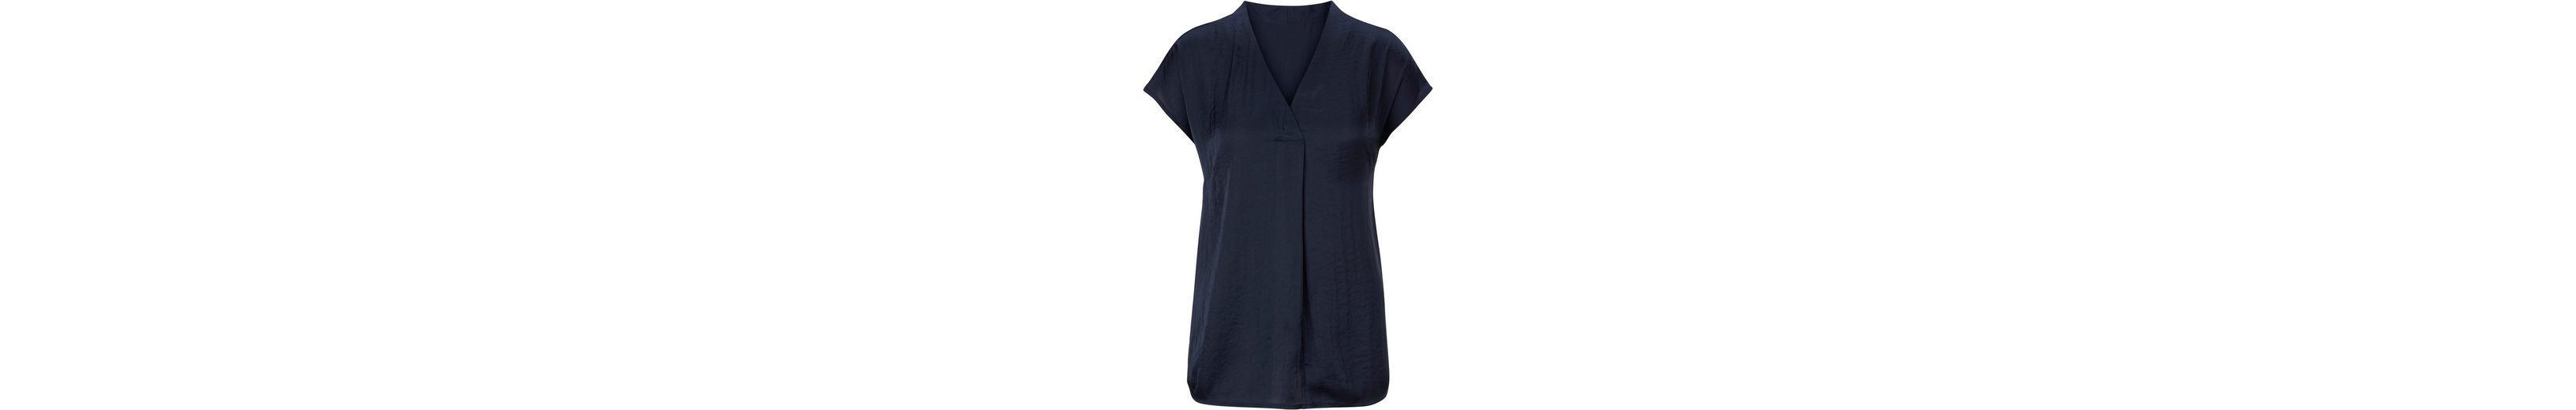 Fair Lady Bluse aus glänzendem, fein geknittertem Stoff